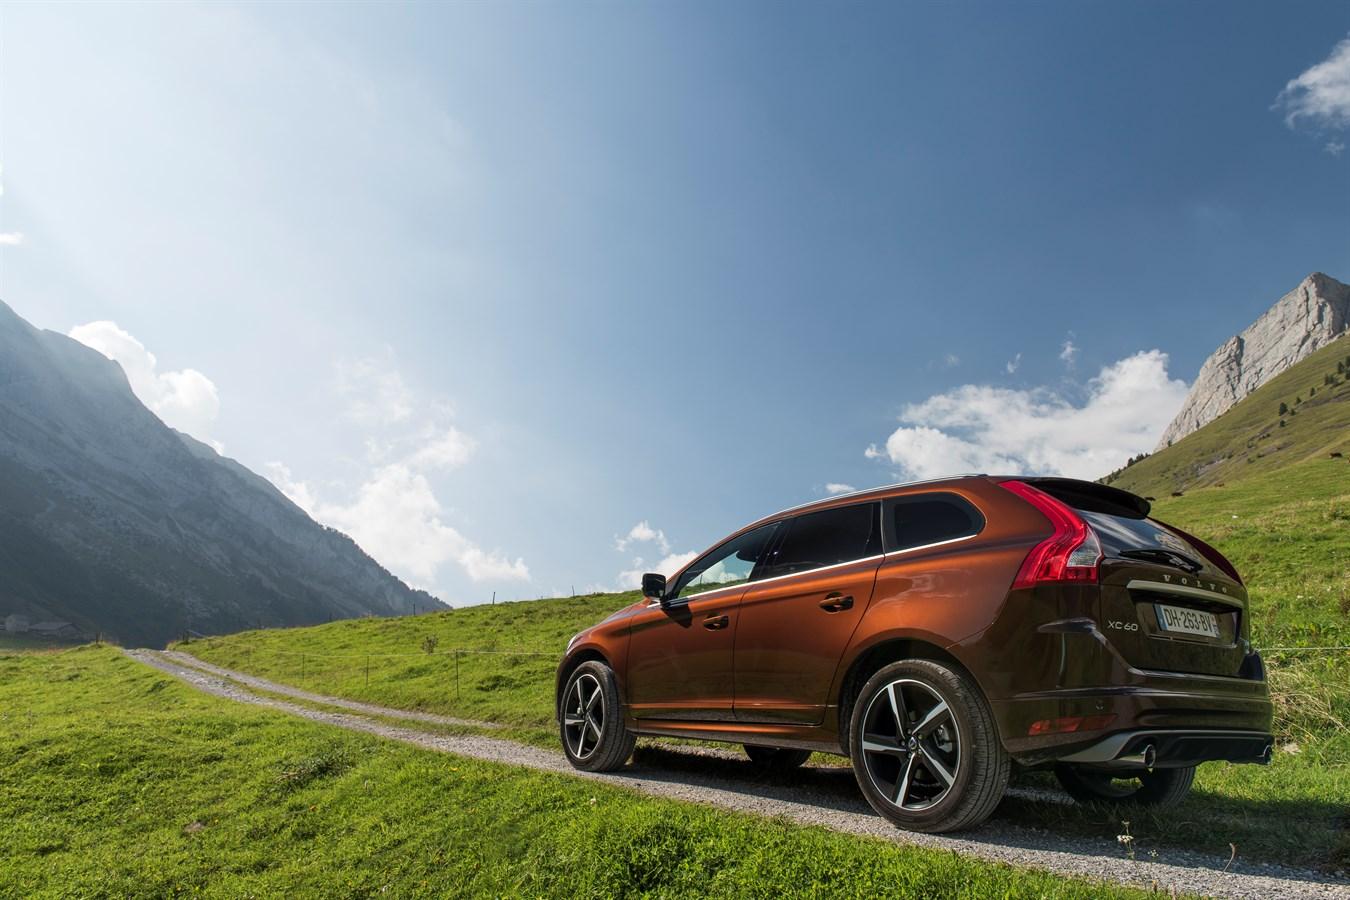 Volvo XC60 gamme Drive-E année modèle 2015